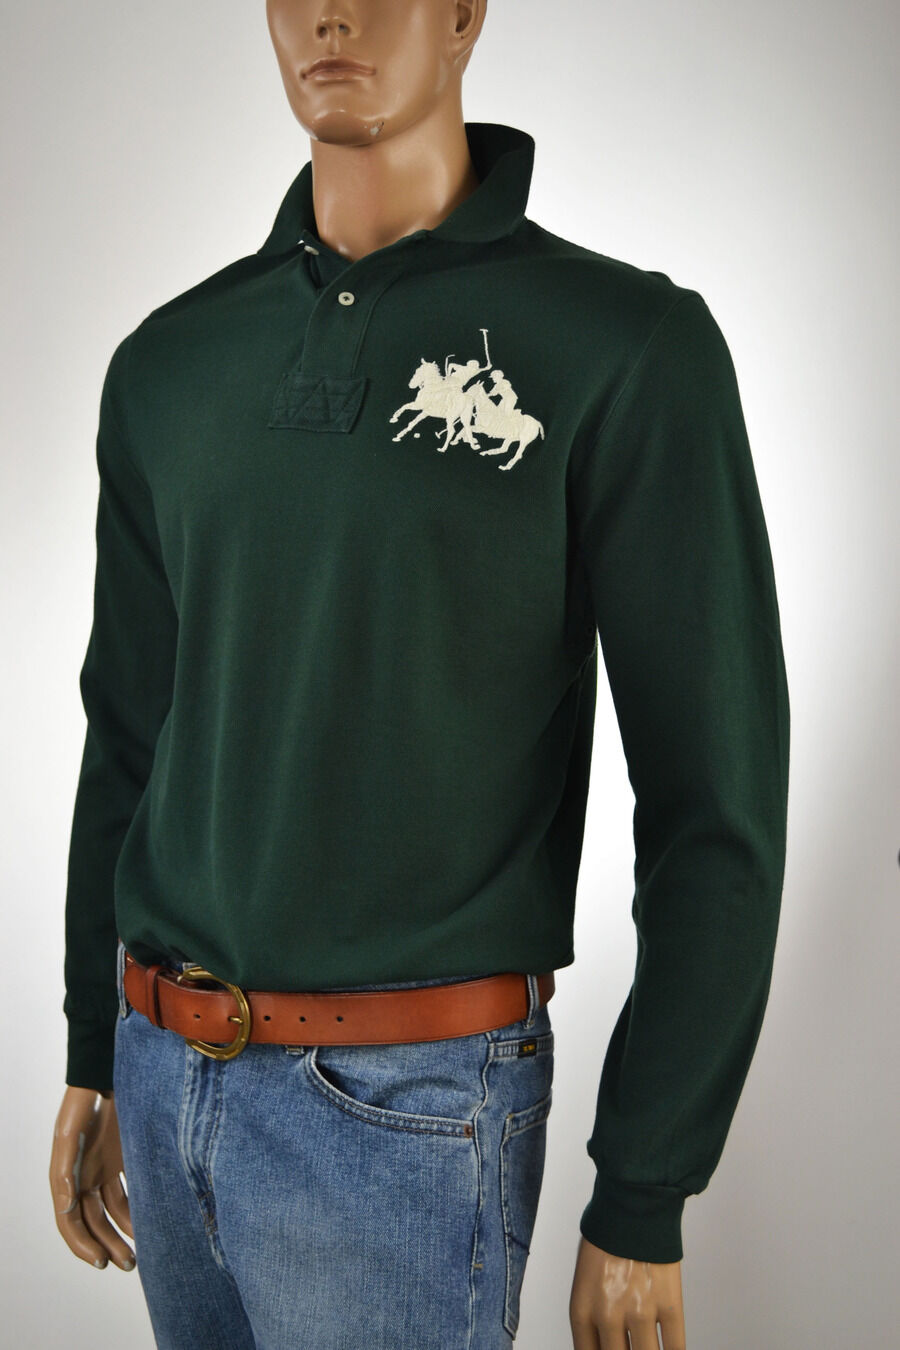 Ralph Lauren Regent Green Mesh Polo Shirt Cream Big Pony Match - NWT